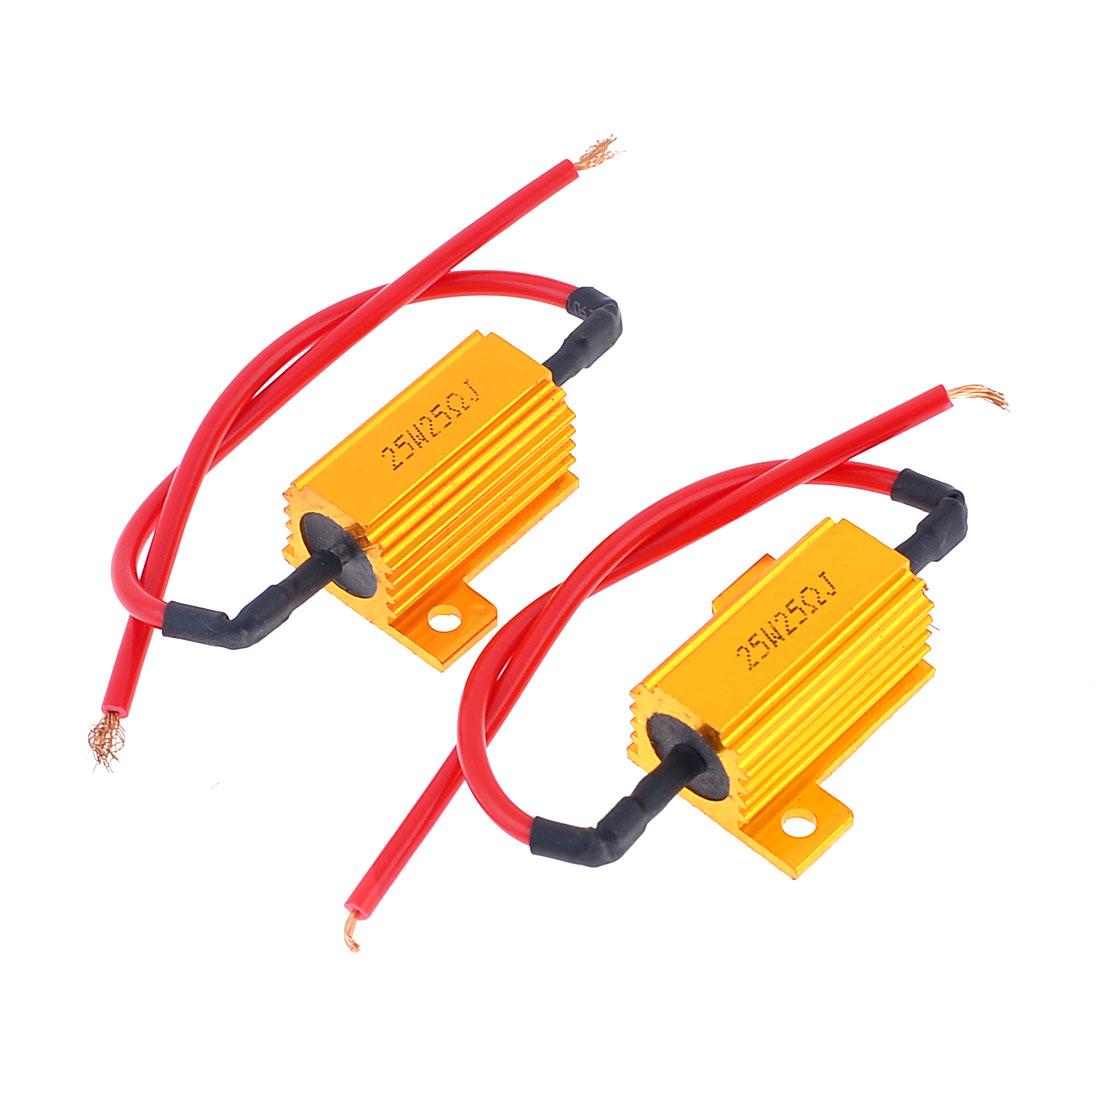 2 x Gold Tone Aluminum Casing Resistors 25W Power 25 Ohm 5% Replacement